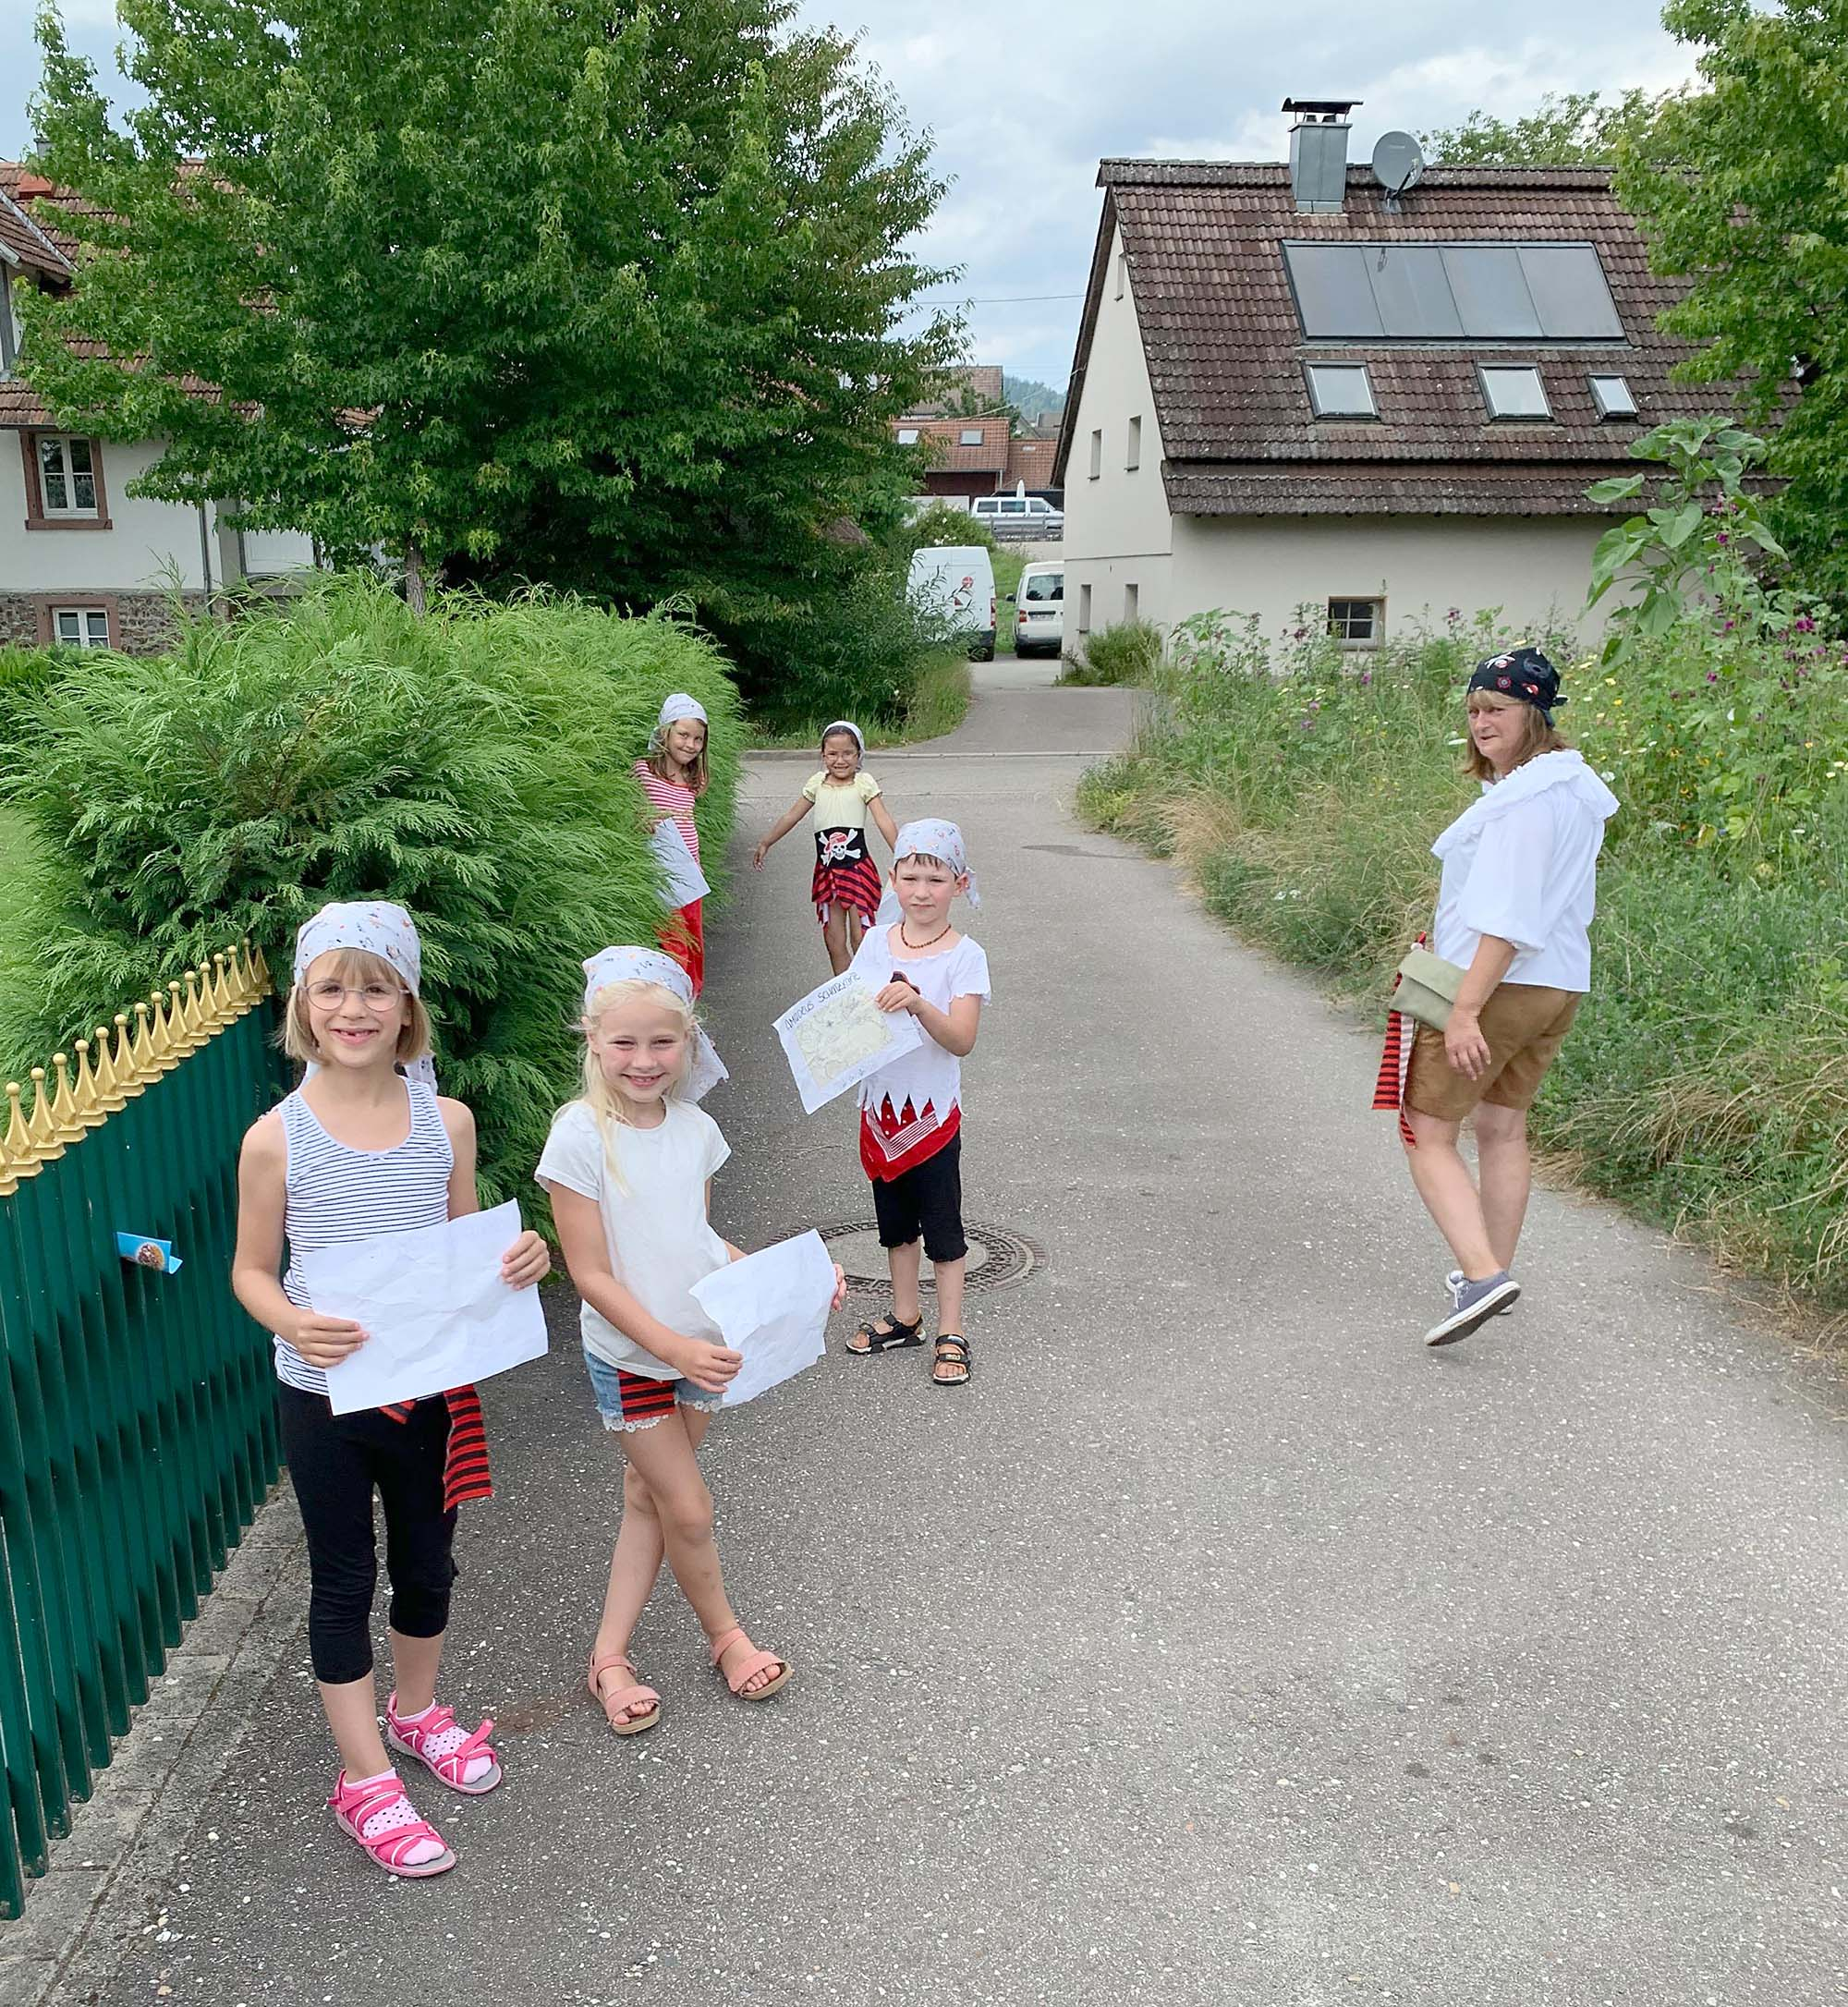 2021-8-13-ZE-UE-privat-Kindergarten-Schatzsuche